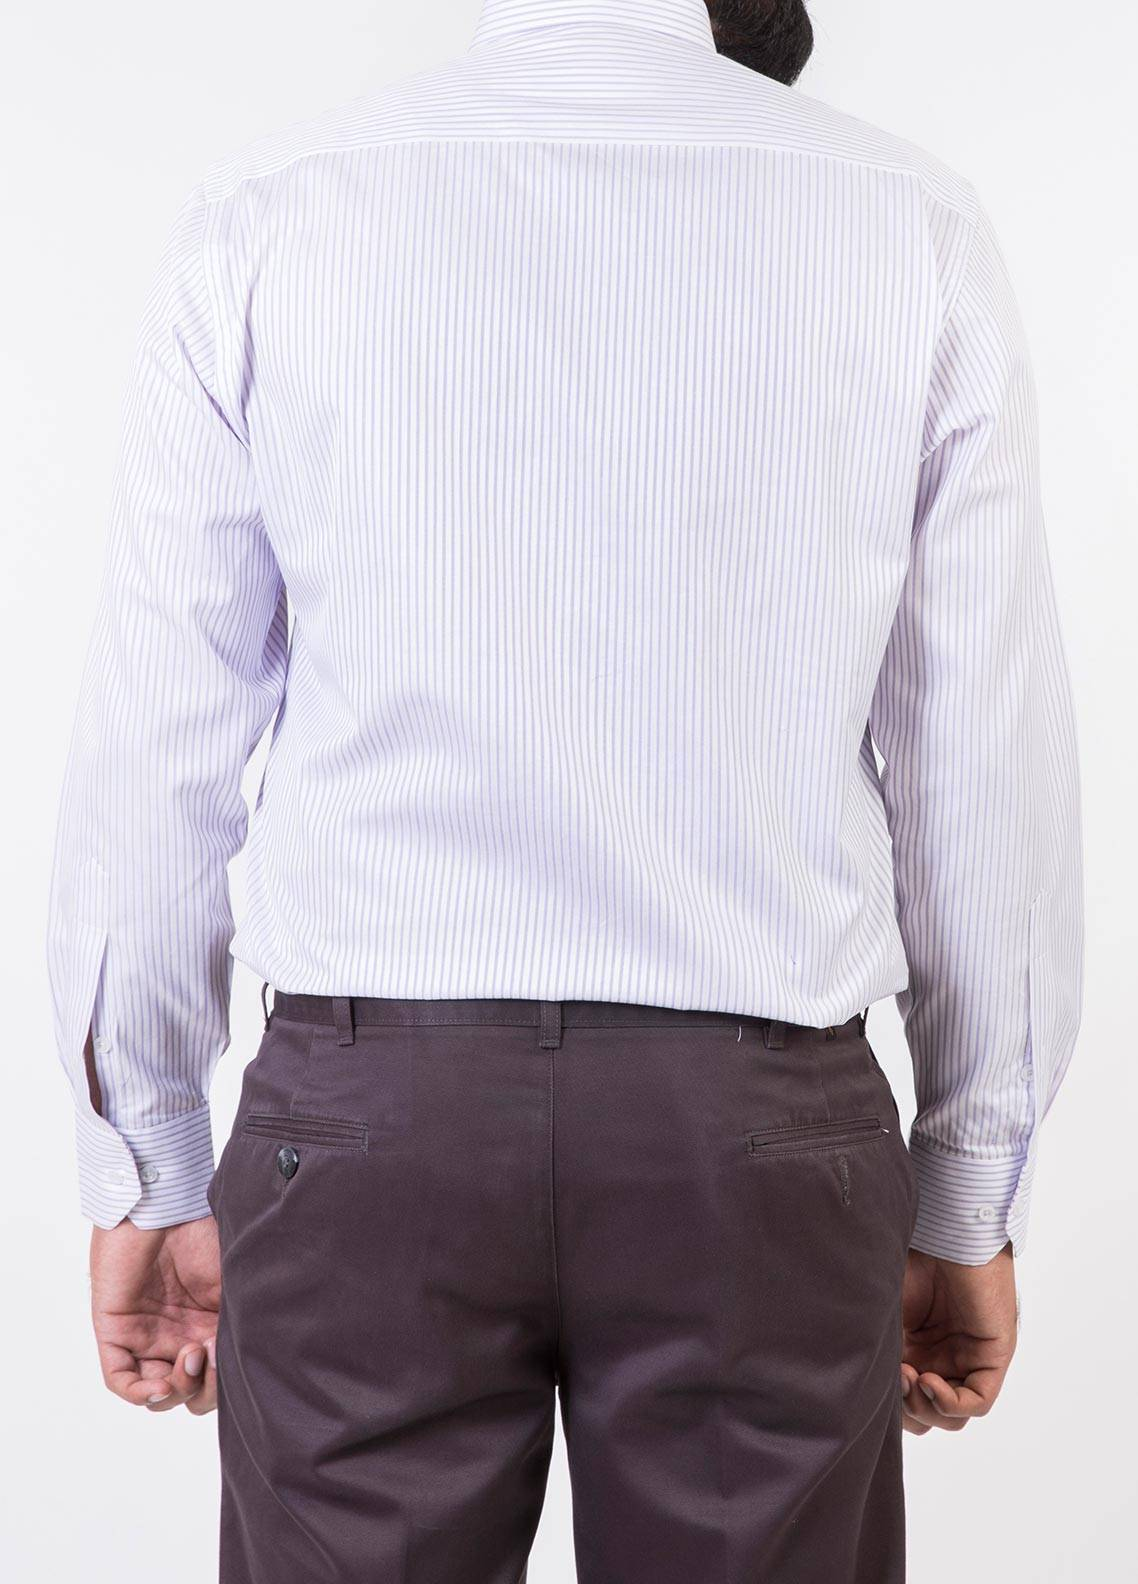 Bien Habille Cotton Formal Shirts for Men -   White Base Purple Lining